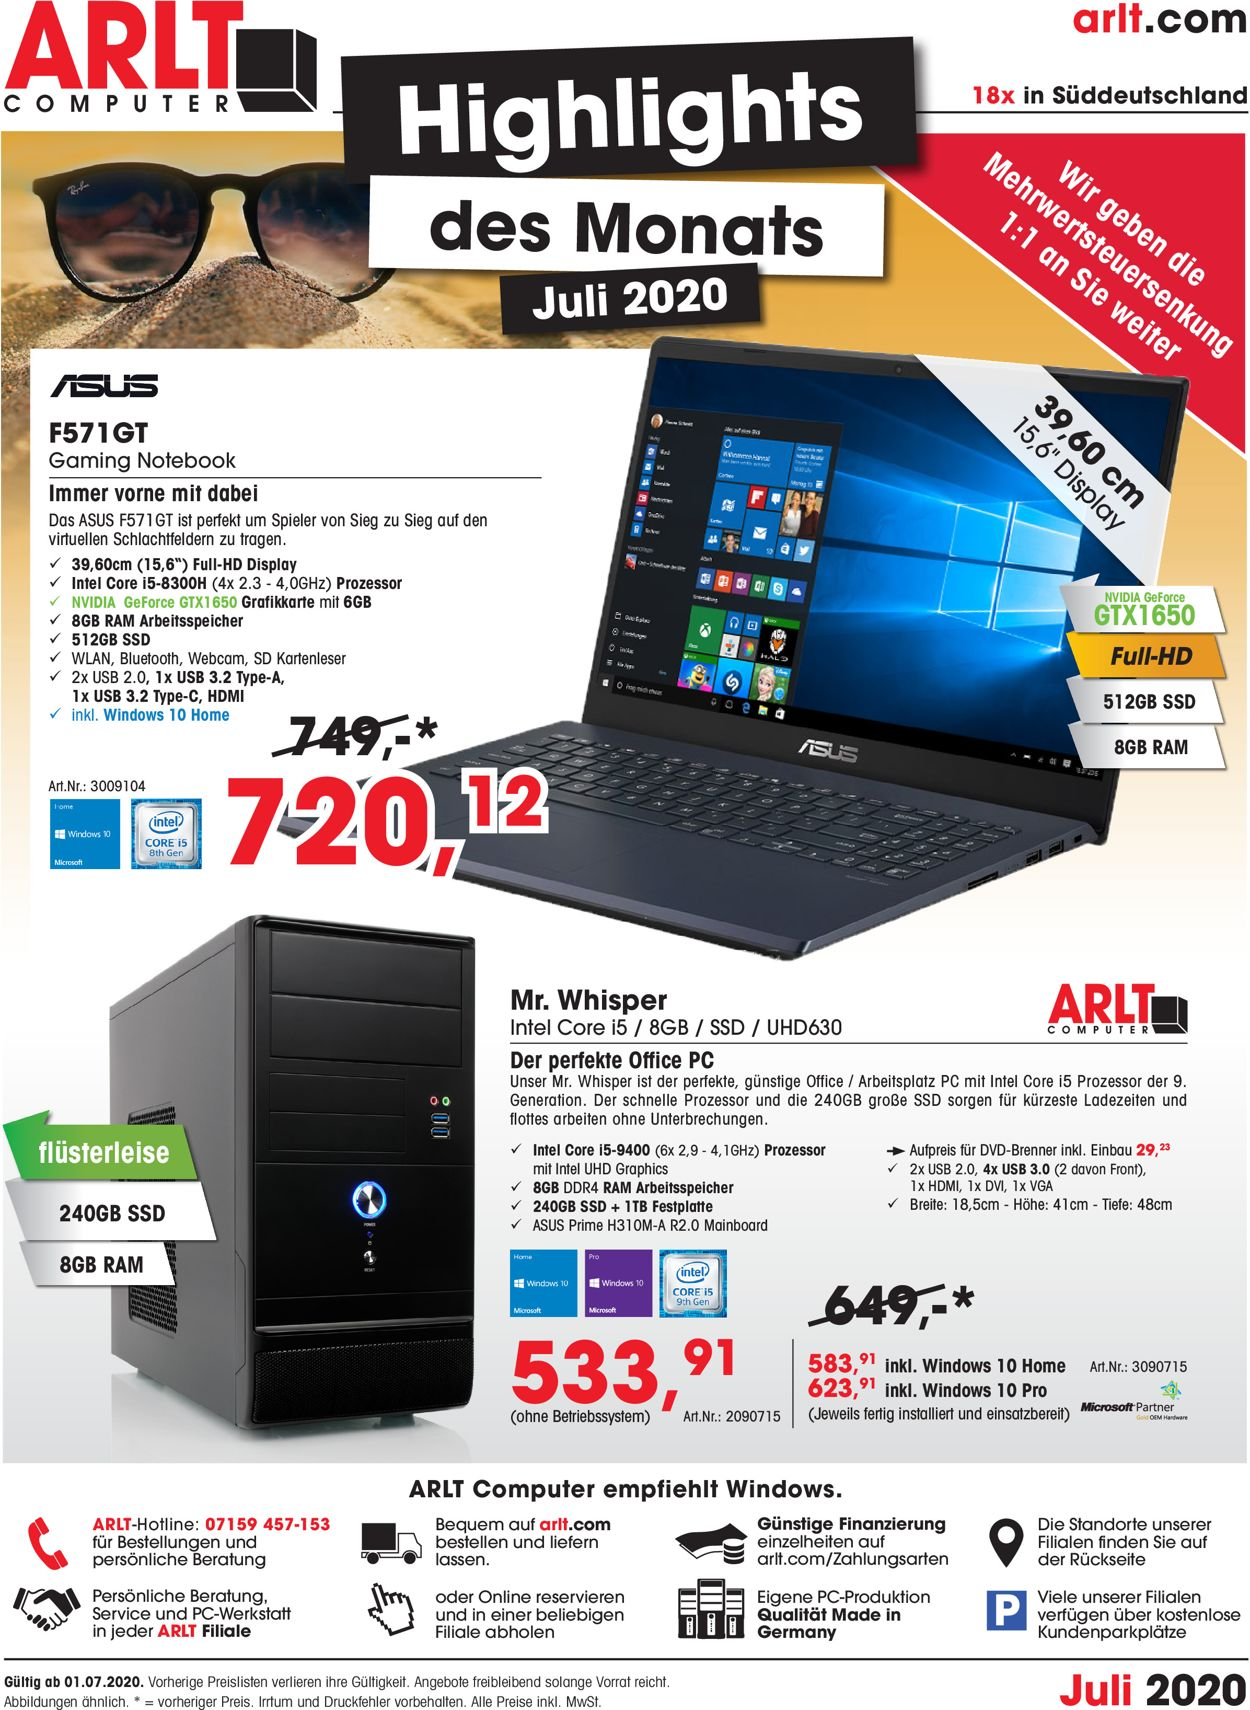 Prospekt ARLT Computer vom 01.07.2020